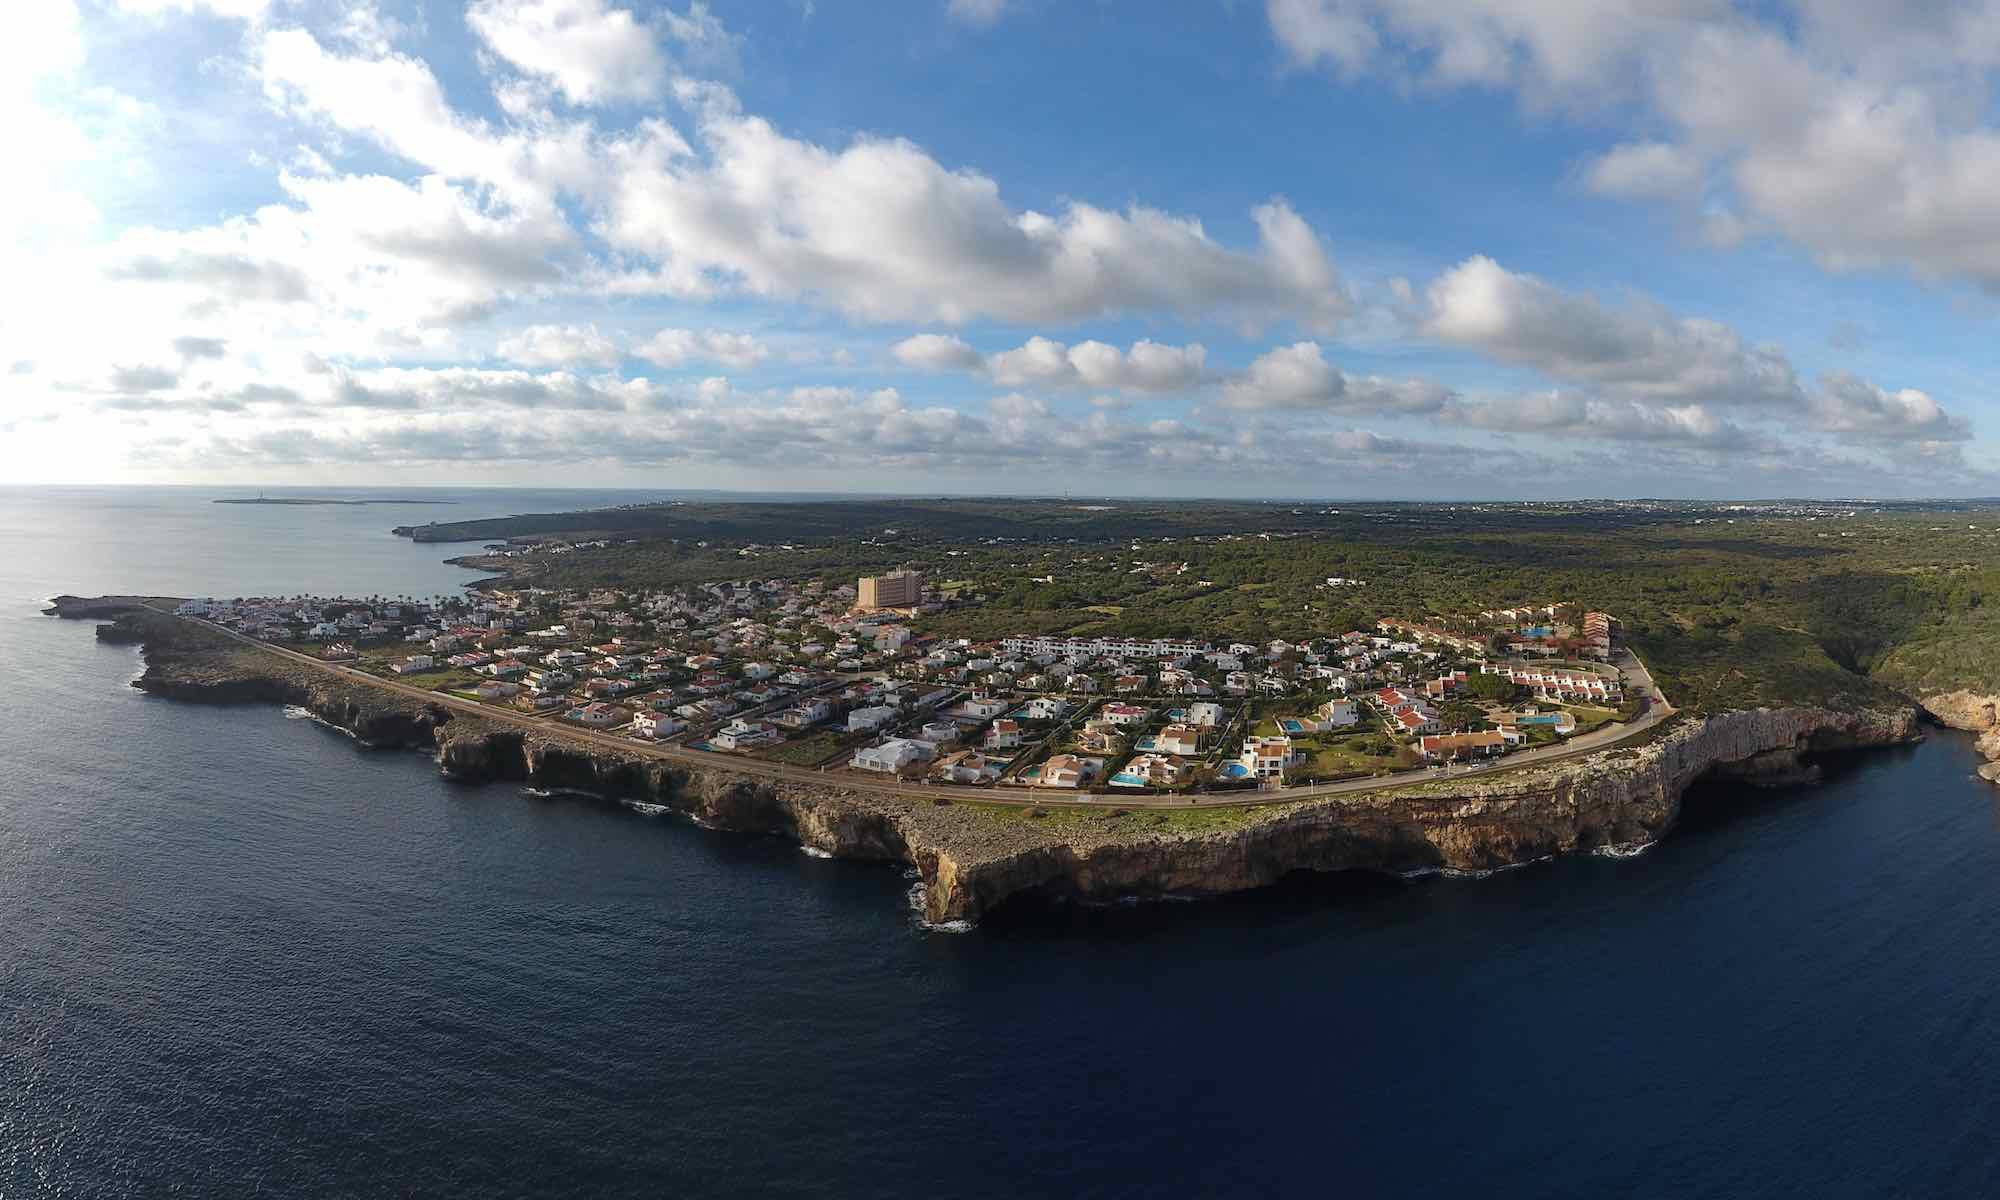 Aerial view of S'Algar in Menorca | #1 For Scuba Diving, PADI Courses & Snorkelling Excursions.